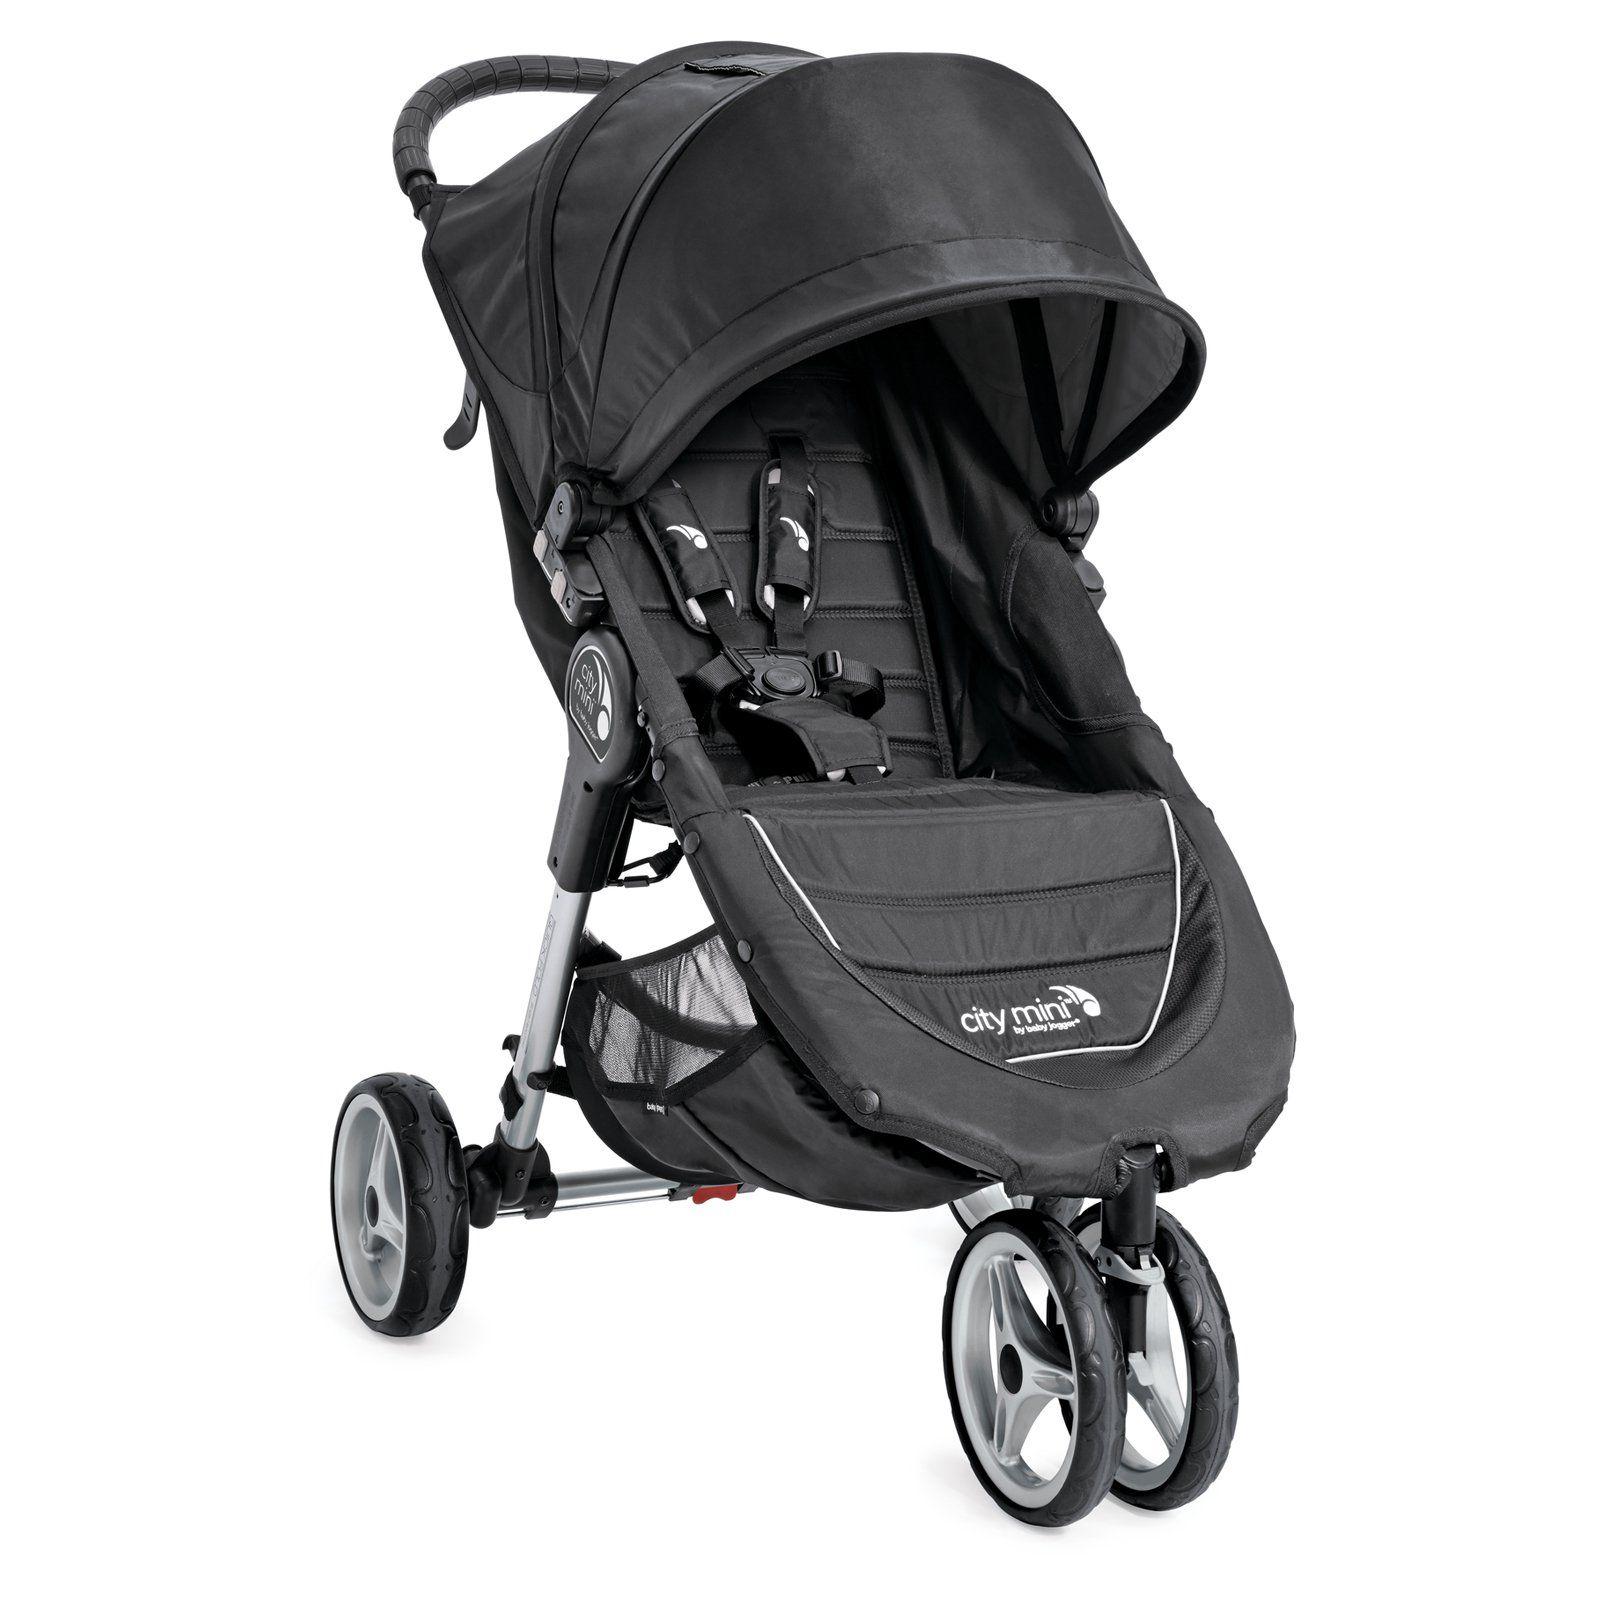 Baby Jogger City Mini 3W Single Stroller Black/Gray